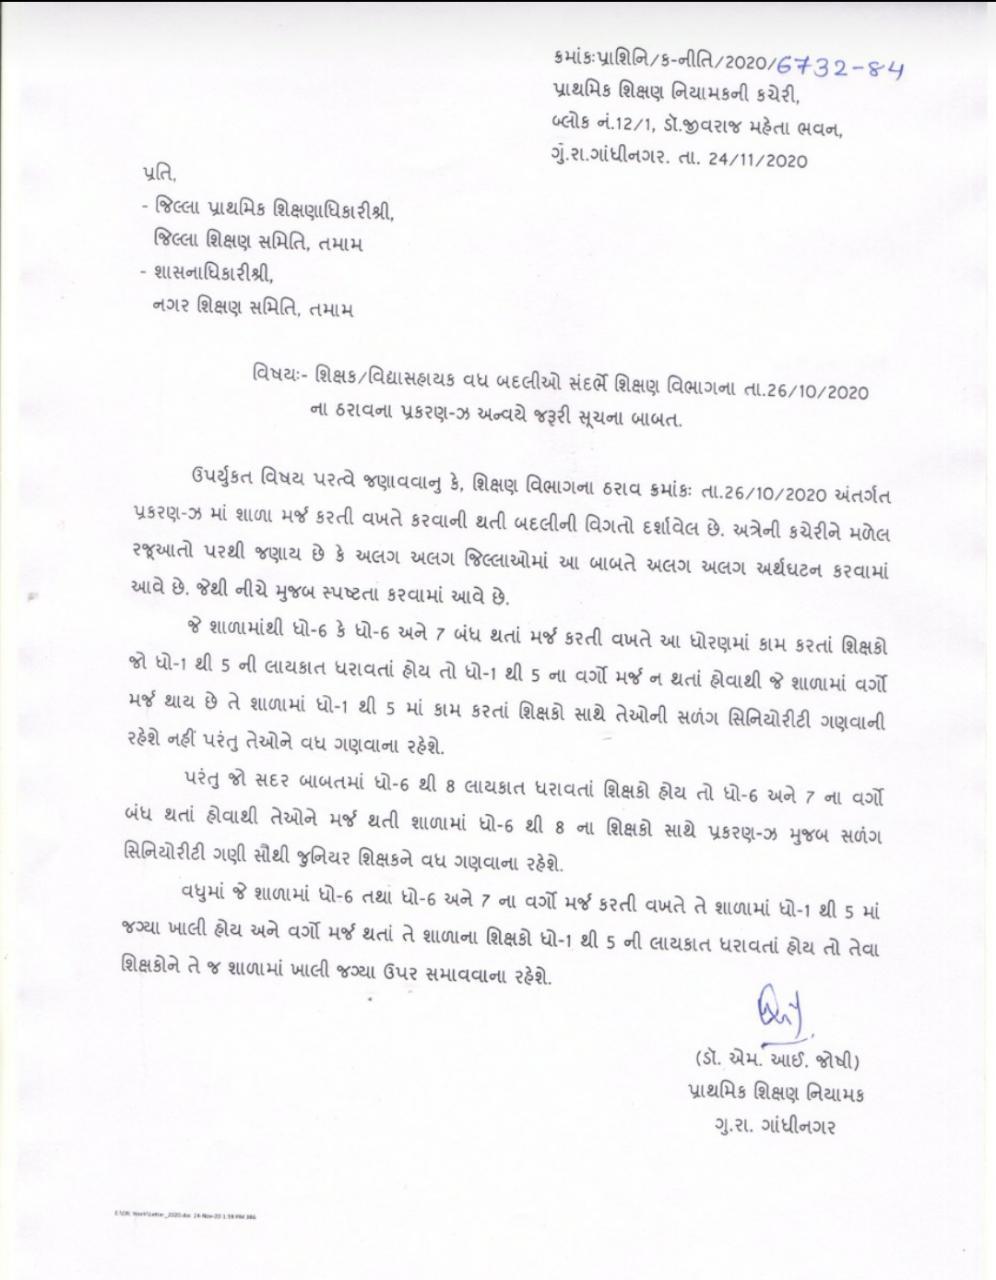 Teacher transfer rules changes in Gujarat